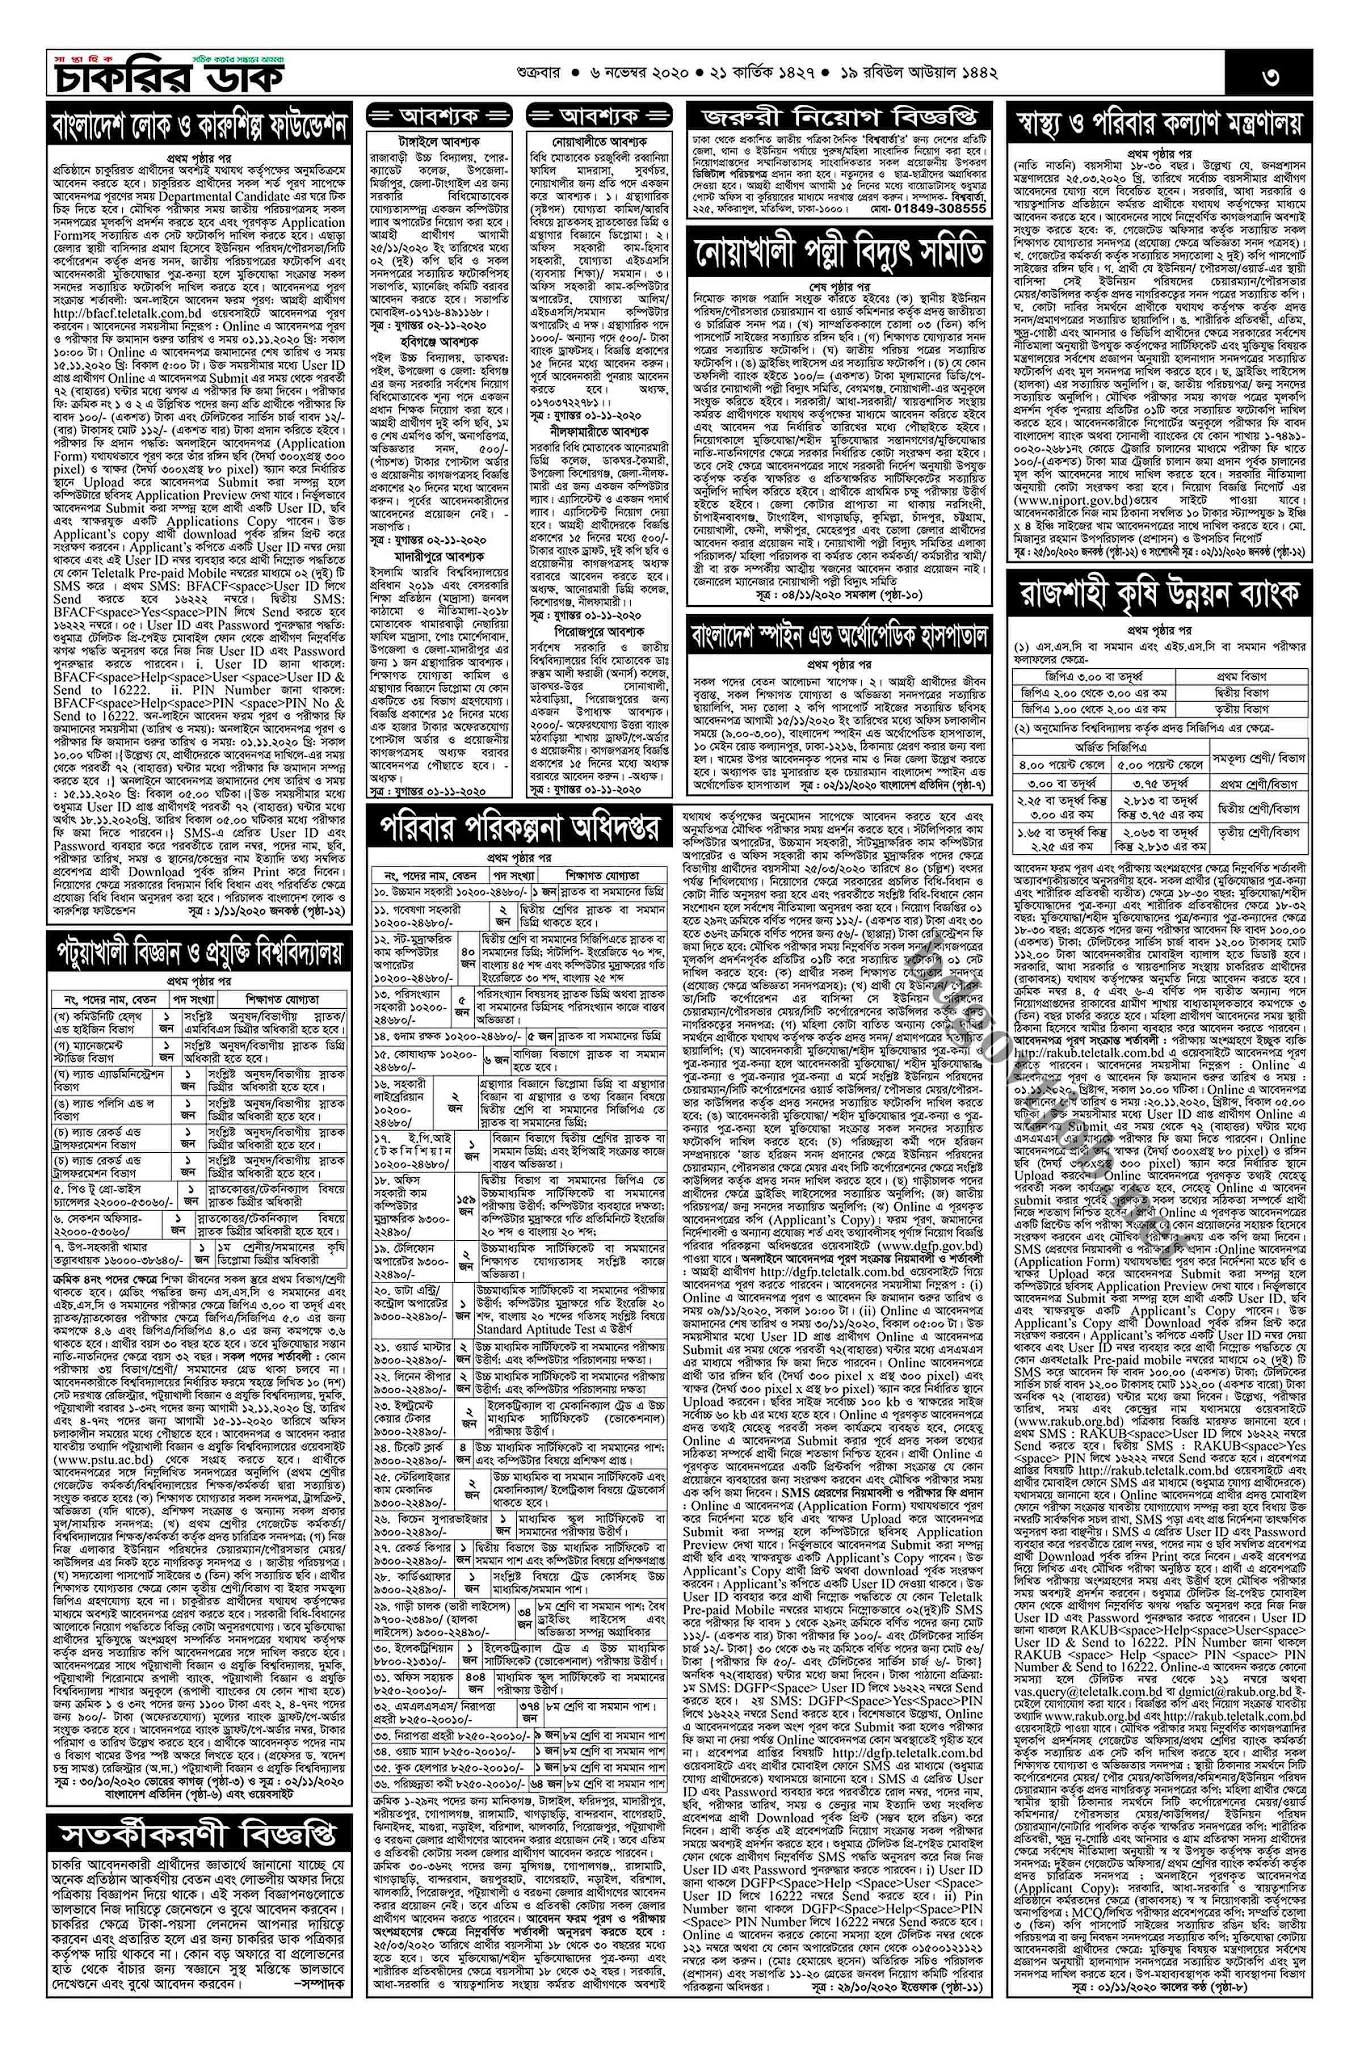 Saptahik Chakrir dak Newspaper 06 October 2020 - সাপ্তাহিক চাকরির ডাক পত্রিকা ০৬ নভেম্বর ২০২০